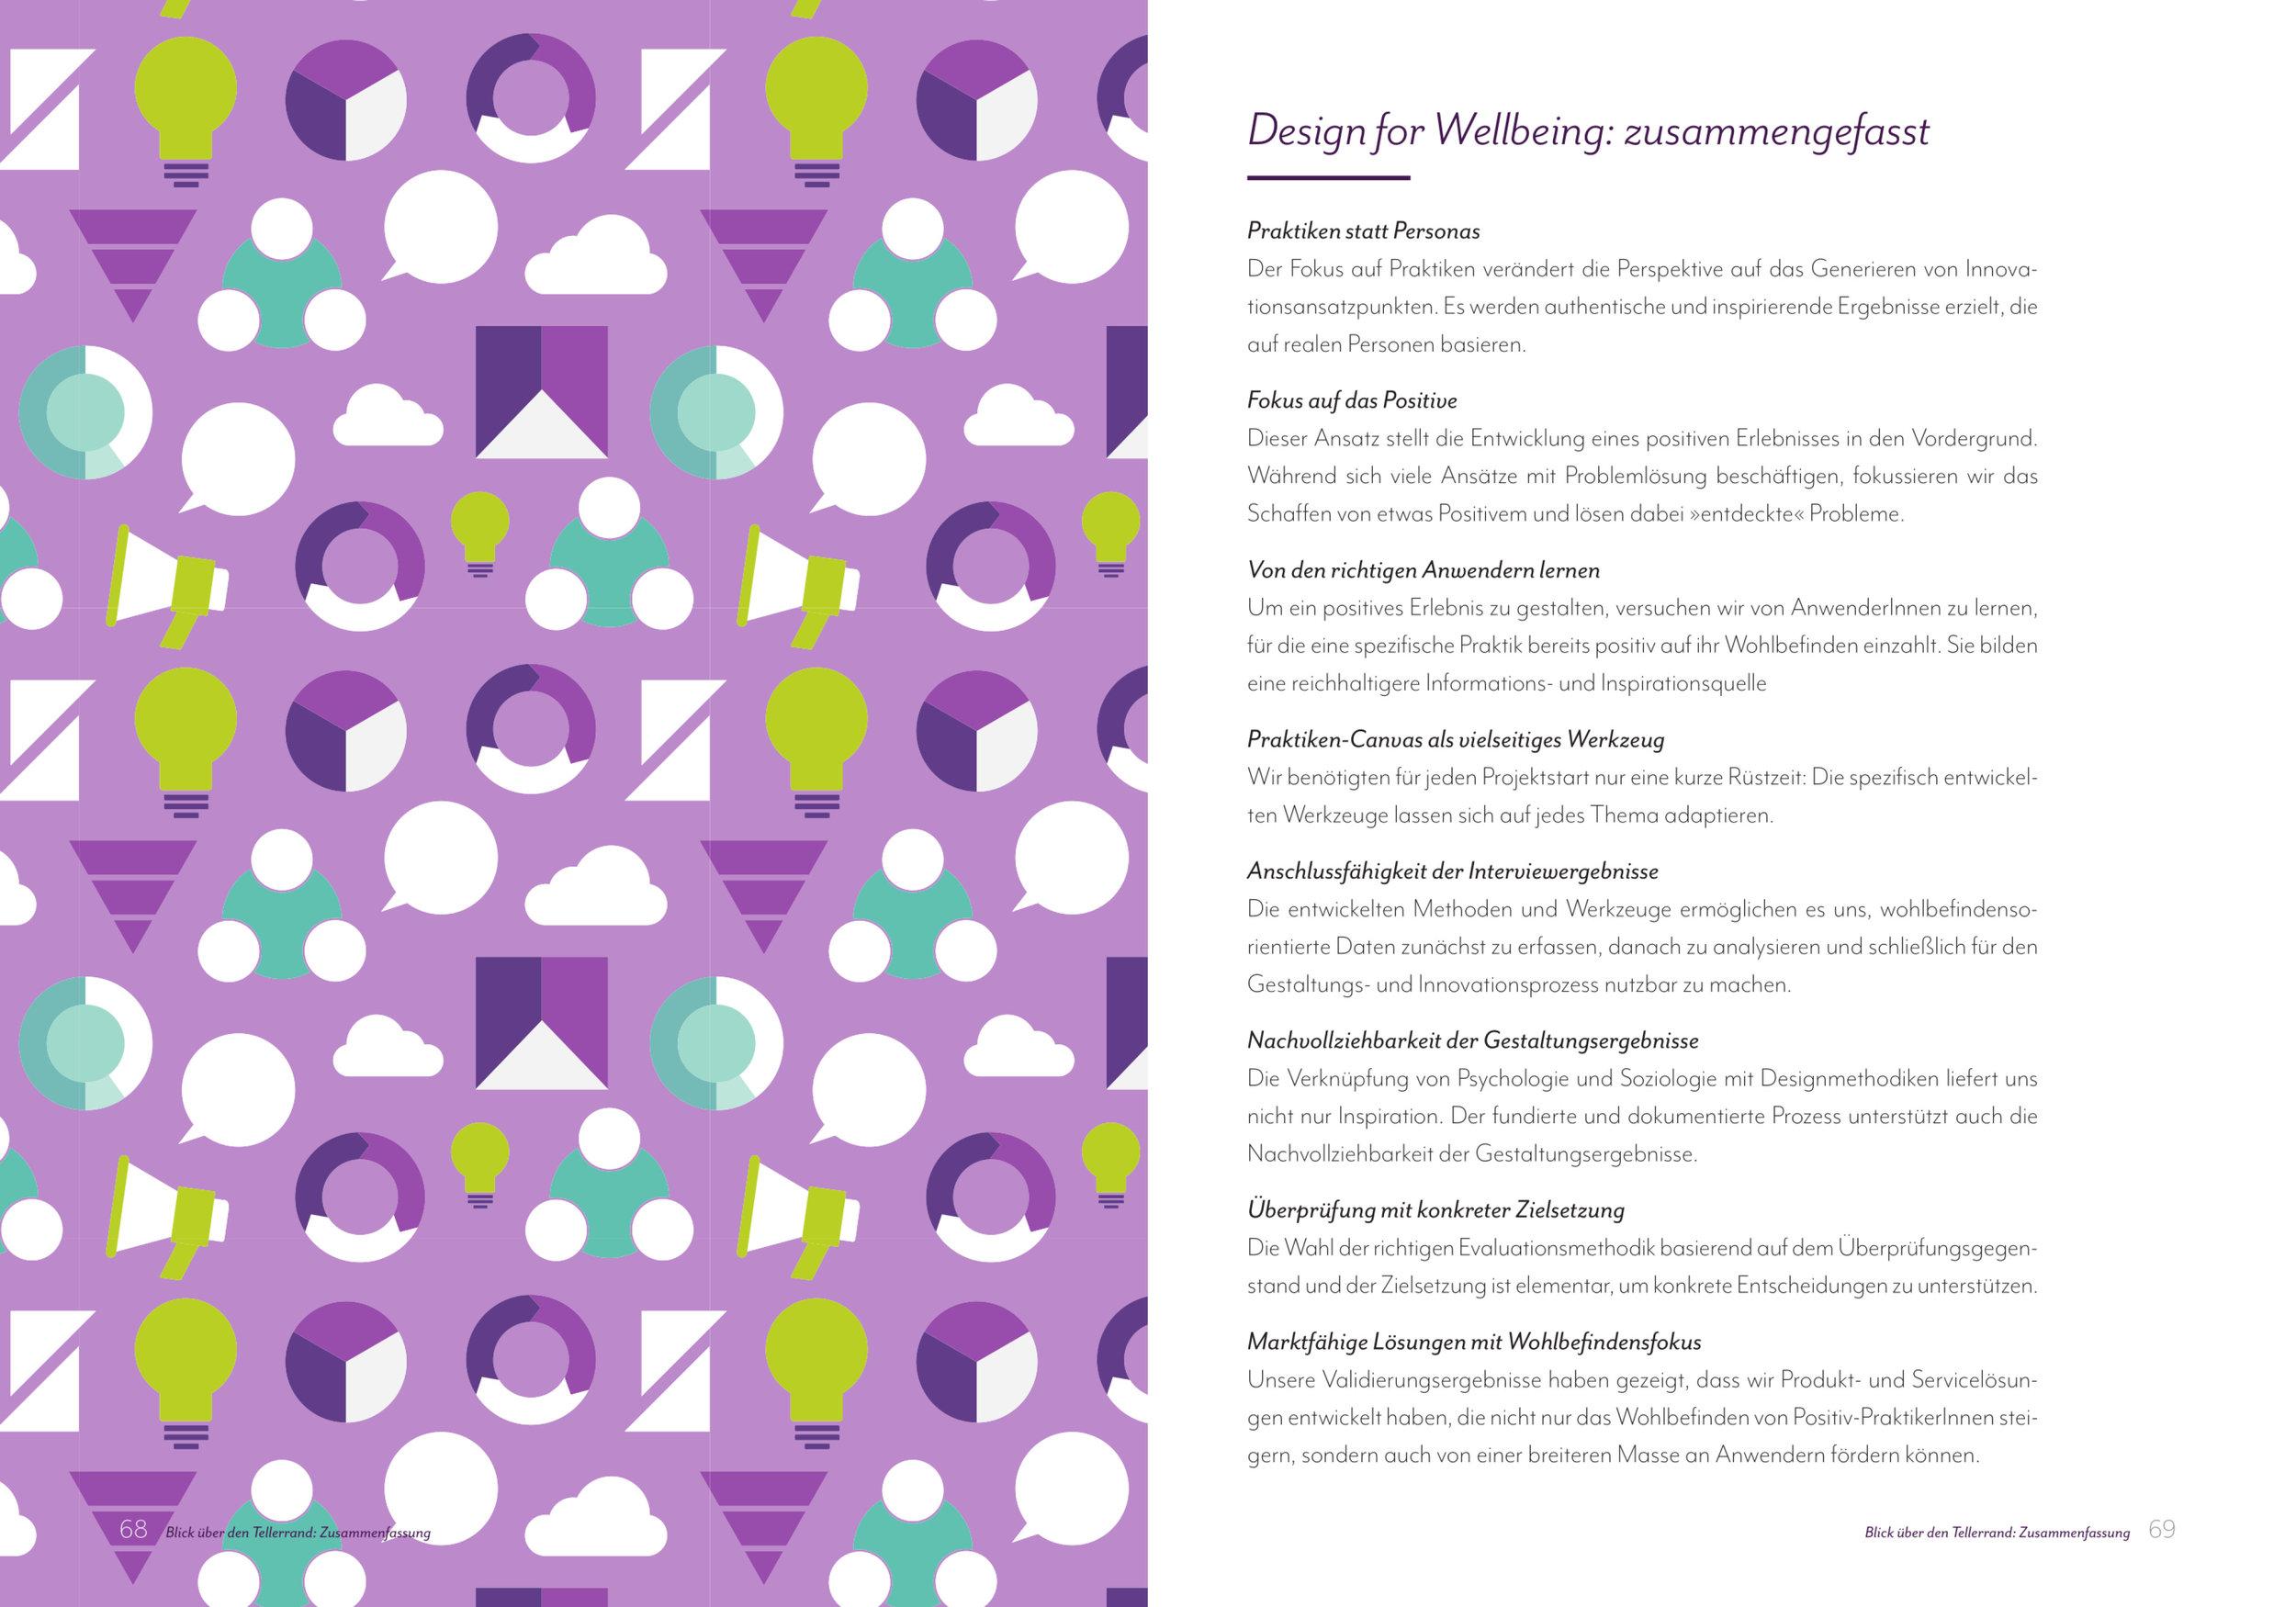 18-11-20 Reference Guide JPGs14.jpg